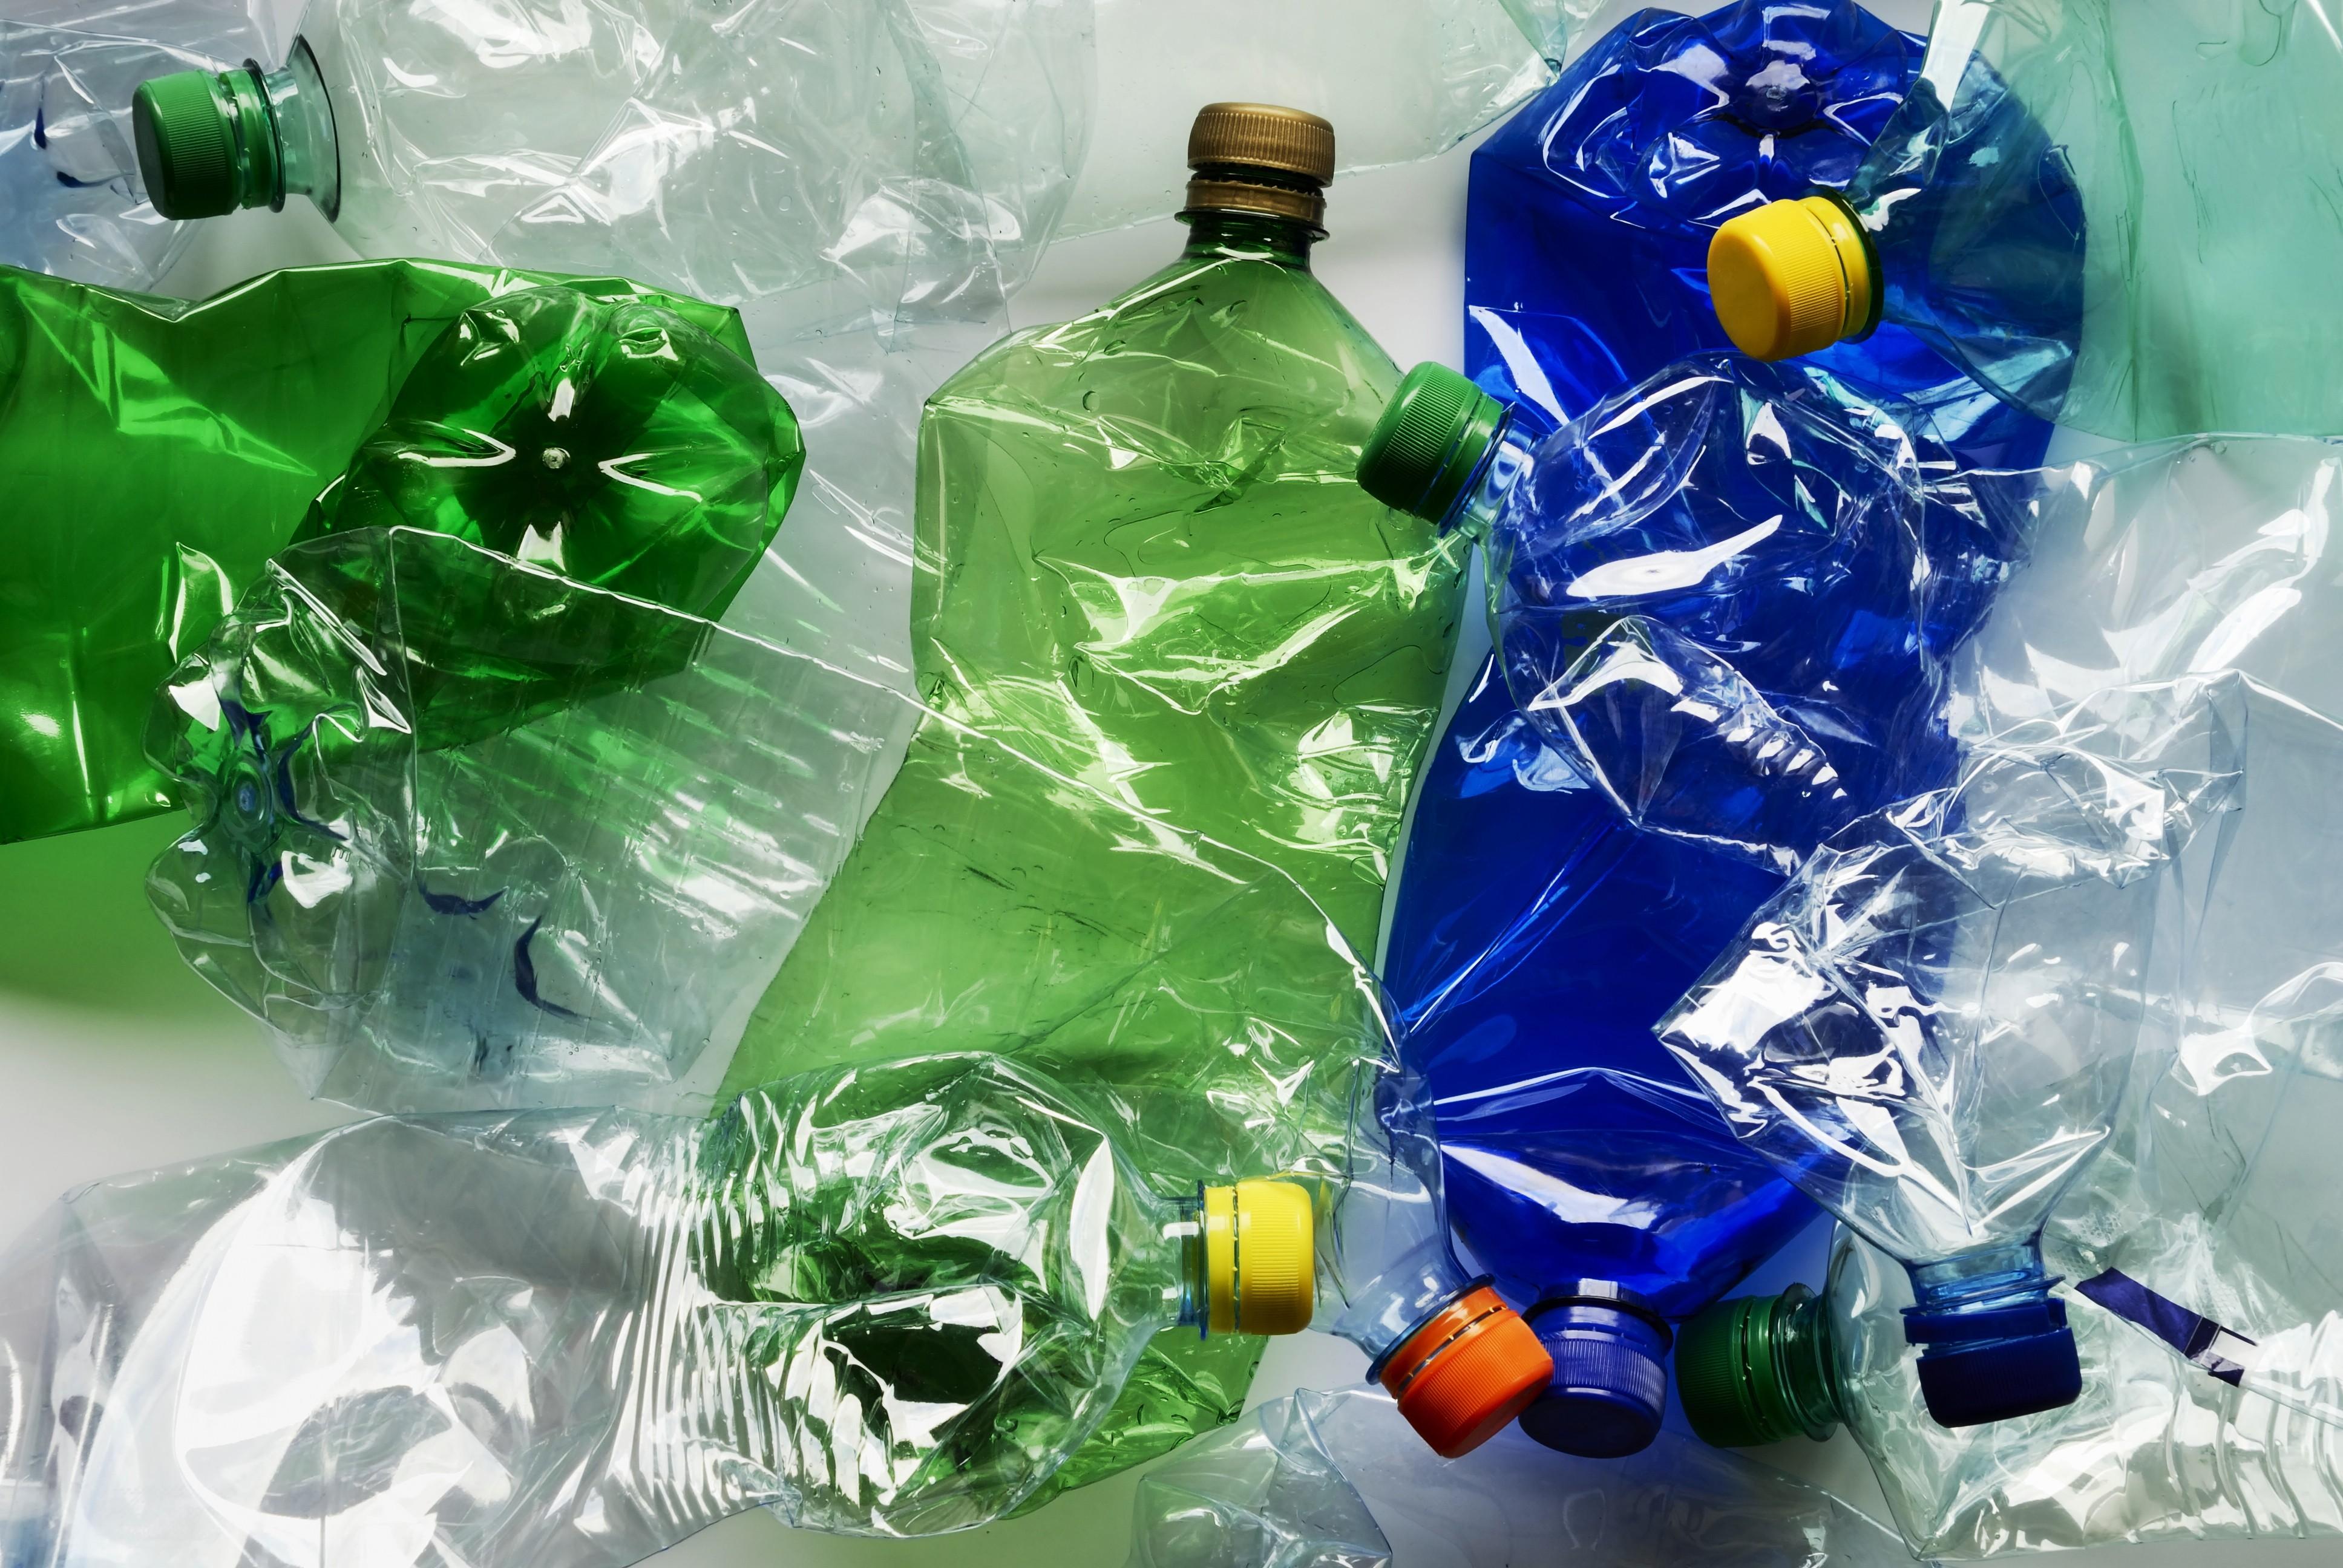 Фото бутылки банки в попе 21 фотография